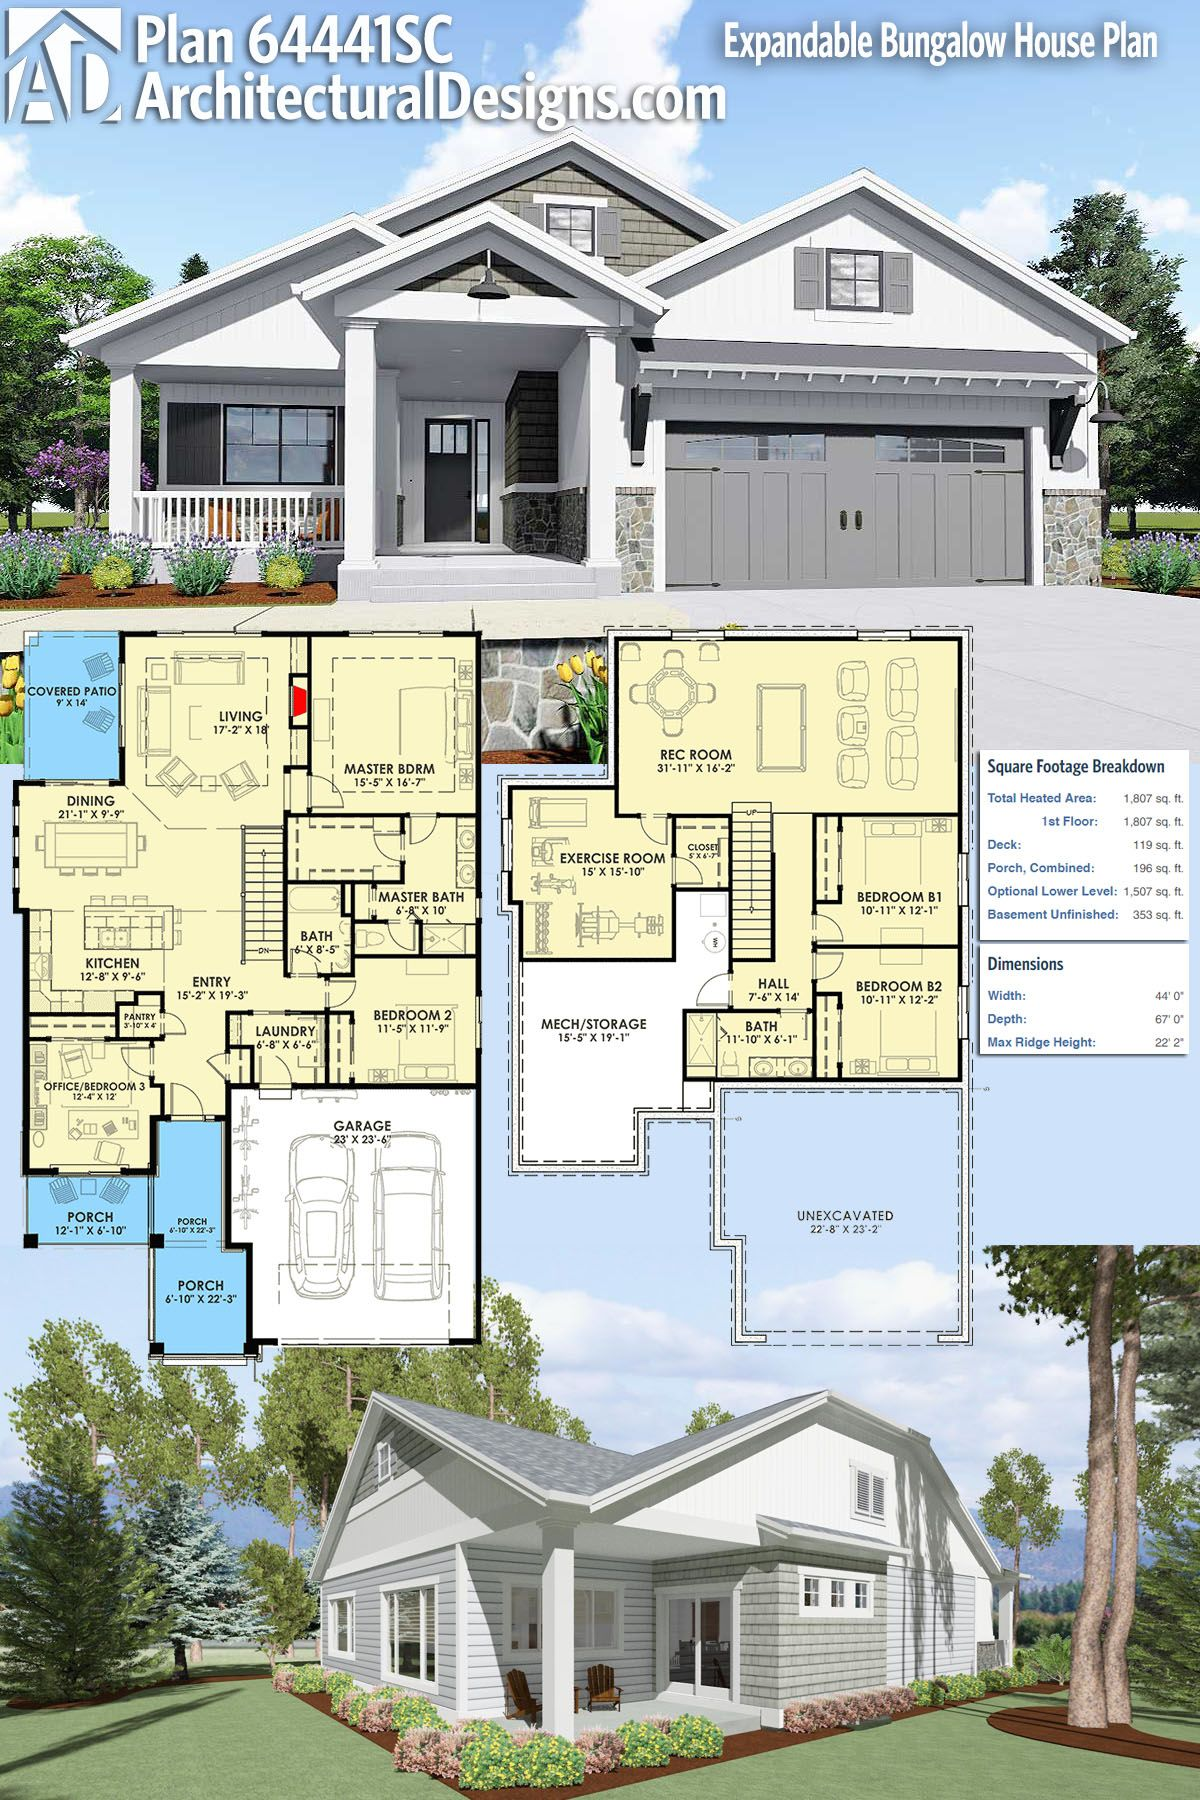 Plan 64441SC Expandable Bungalow House Plan